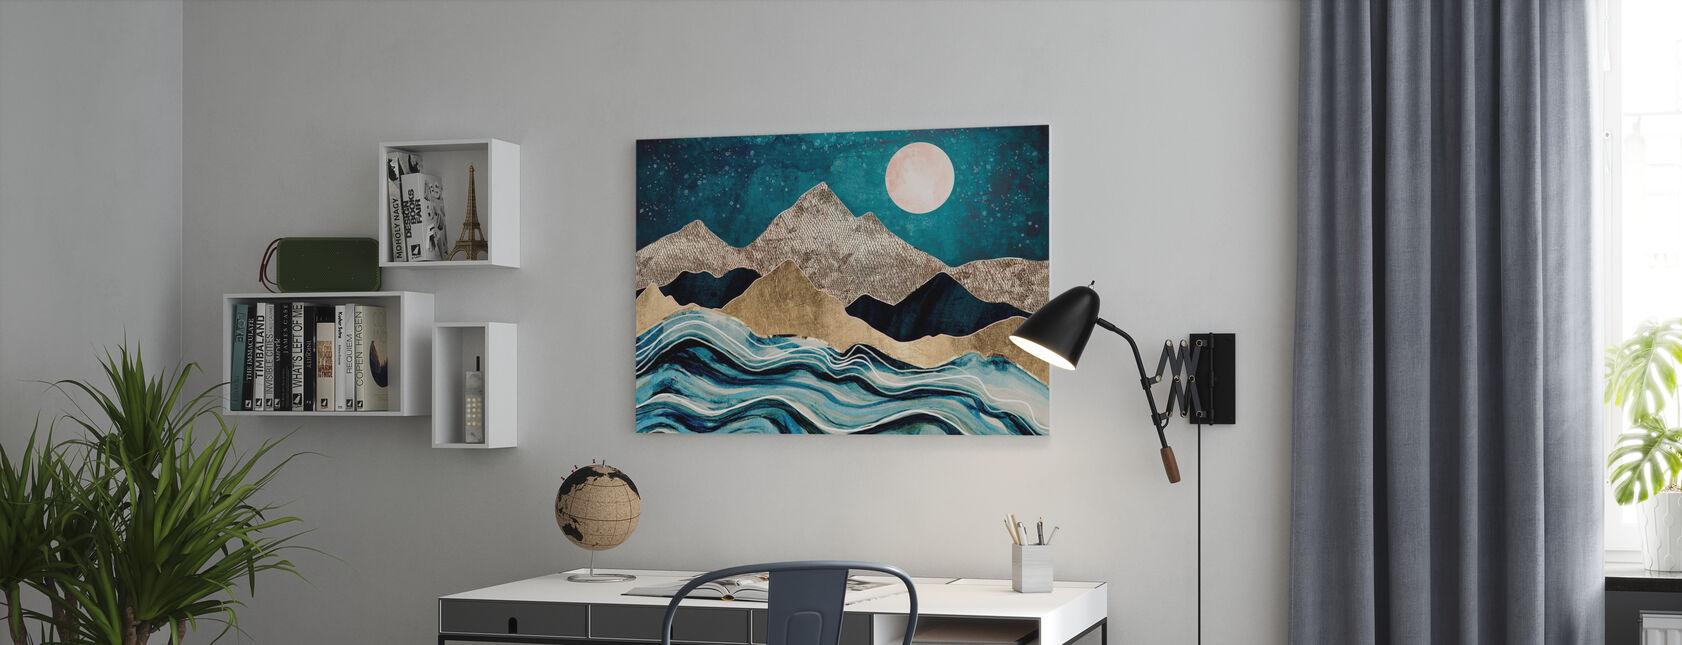 Mer d'Indigo - Impression sur toile - Bureau